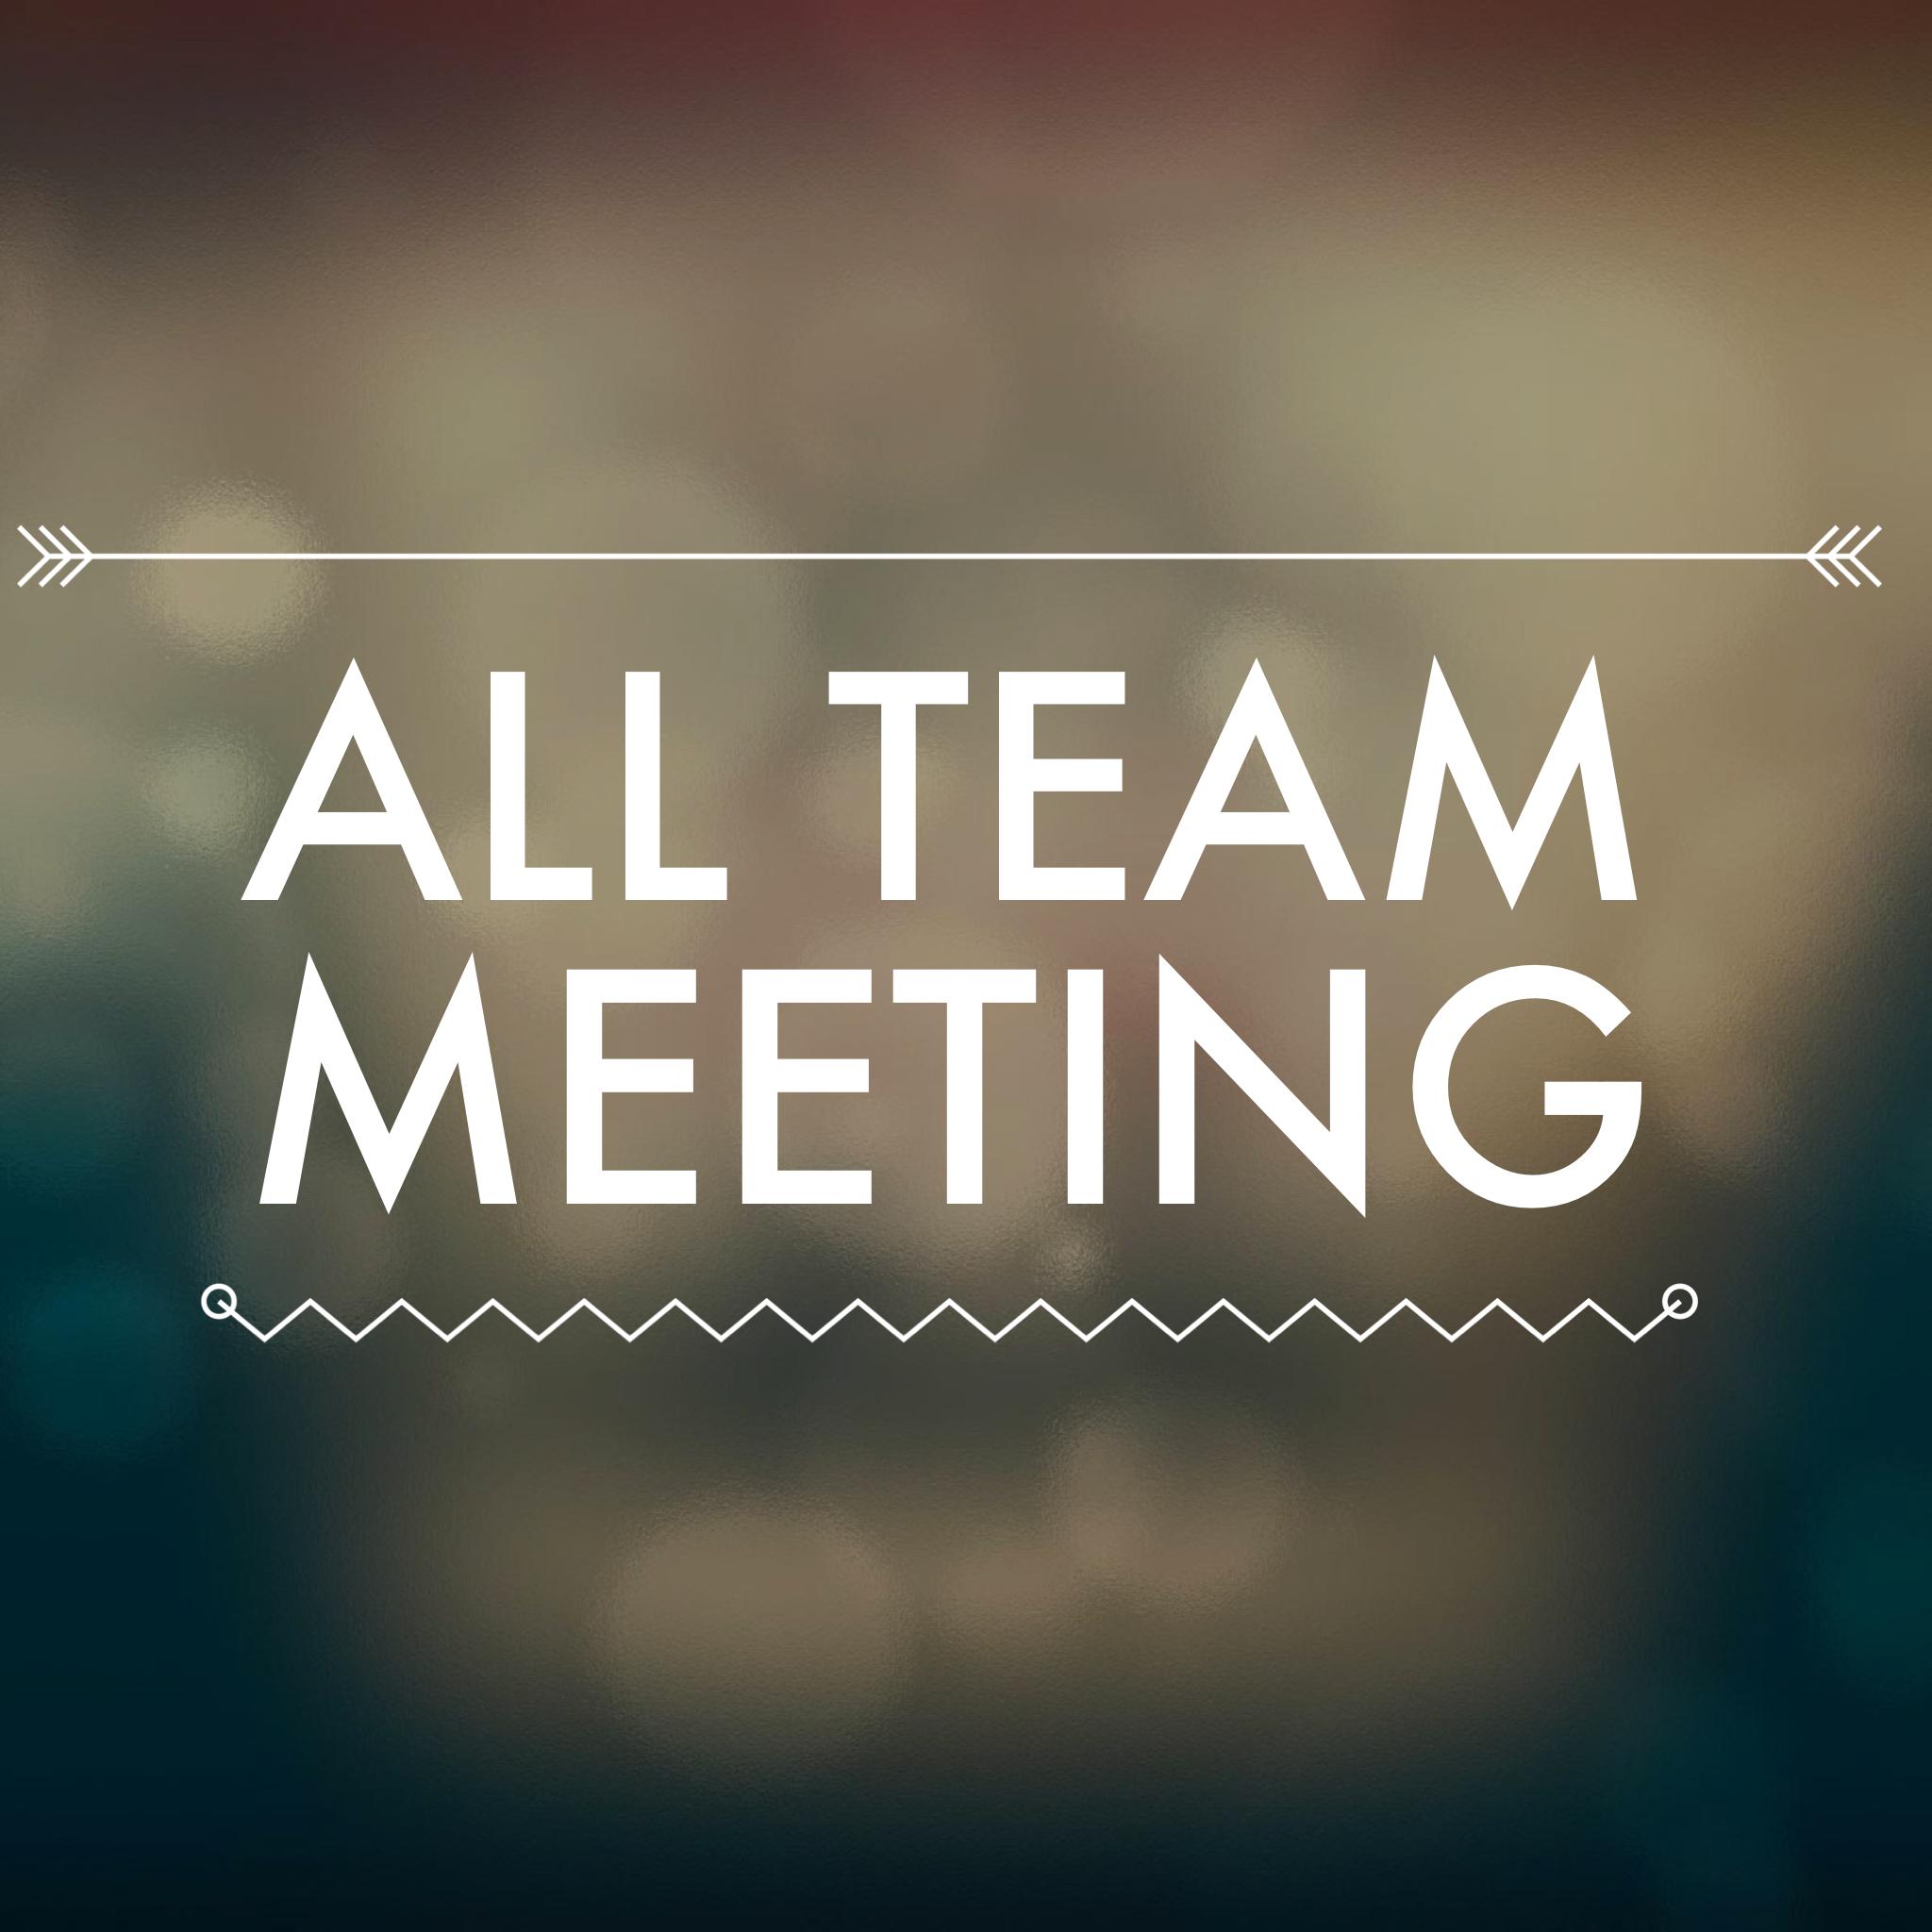 All team meeting